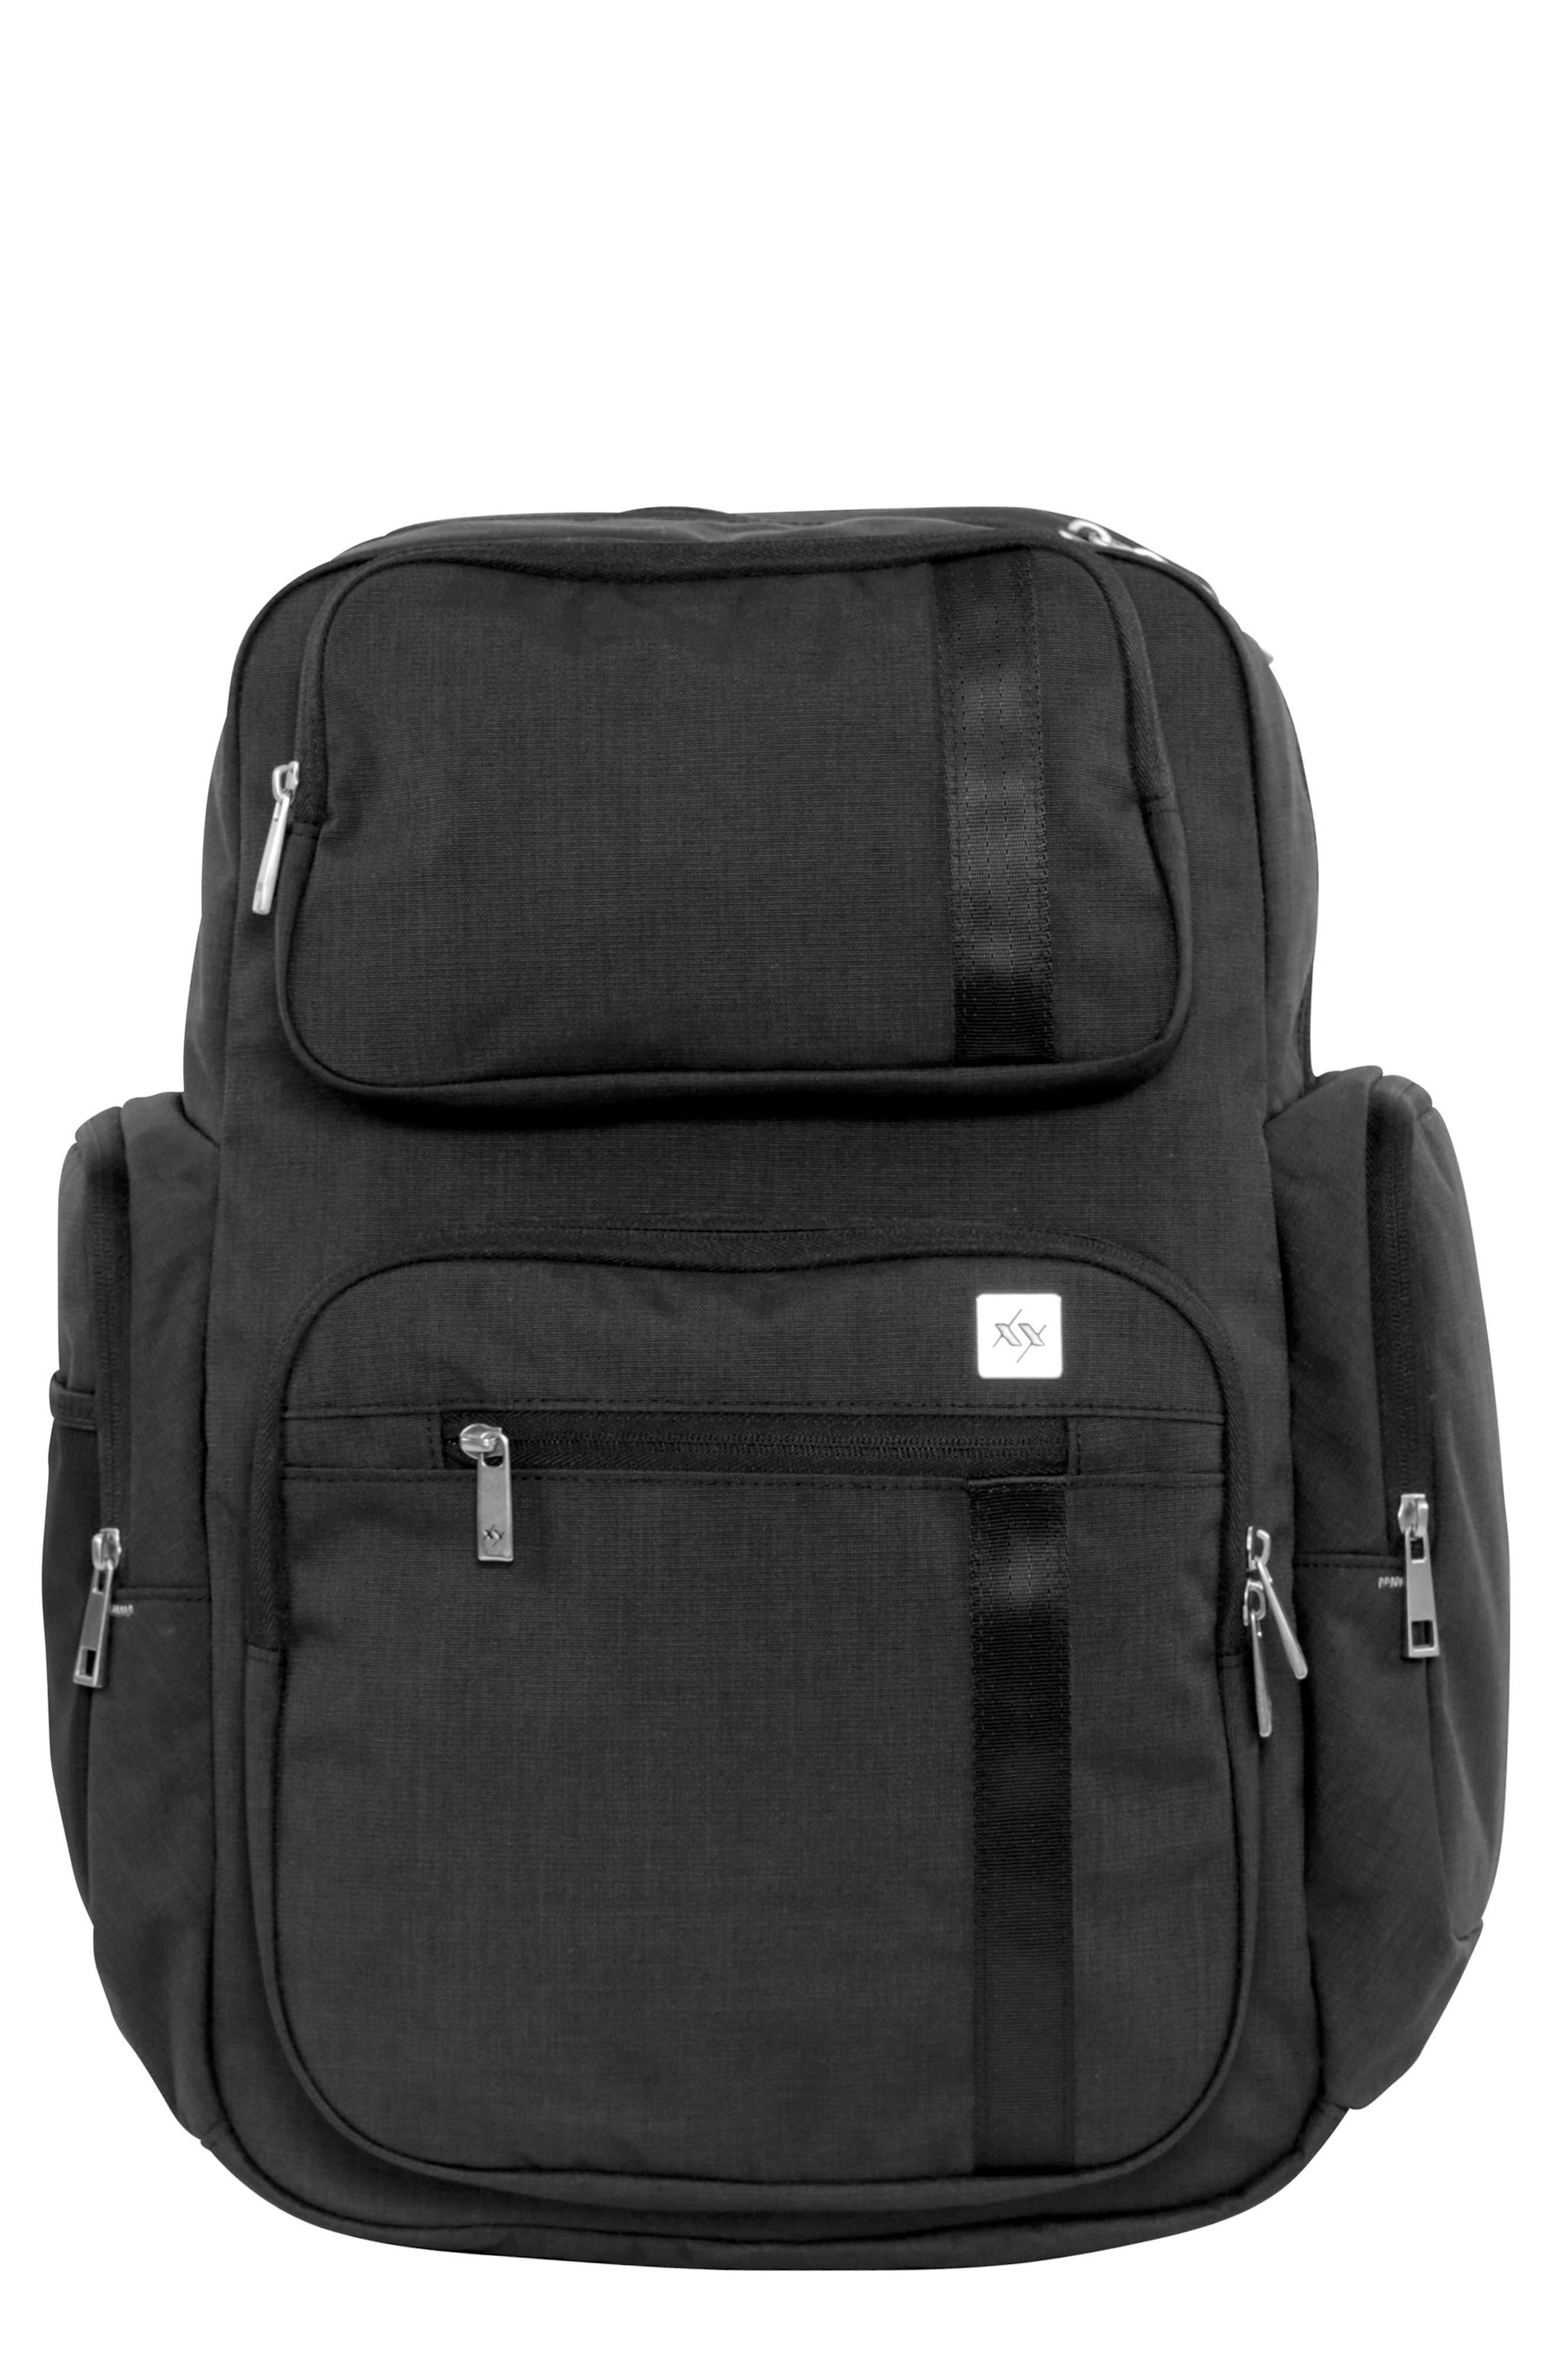 XY Vector Diaper Backpack,                             Main thumbnail 1, color,                             Carbon